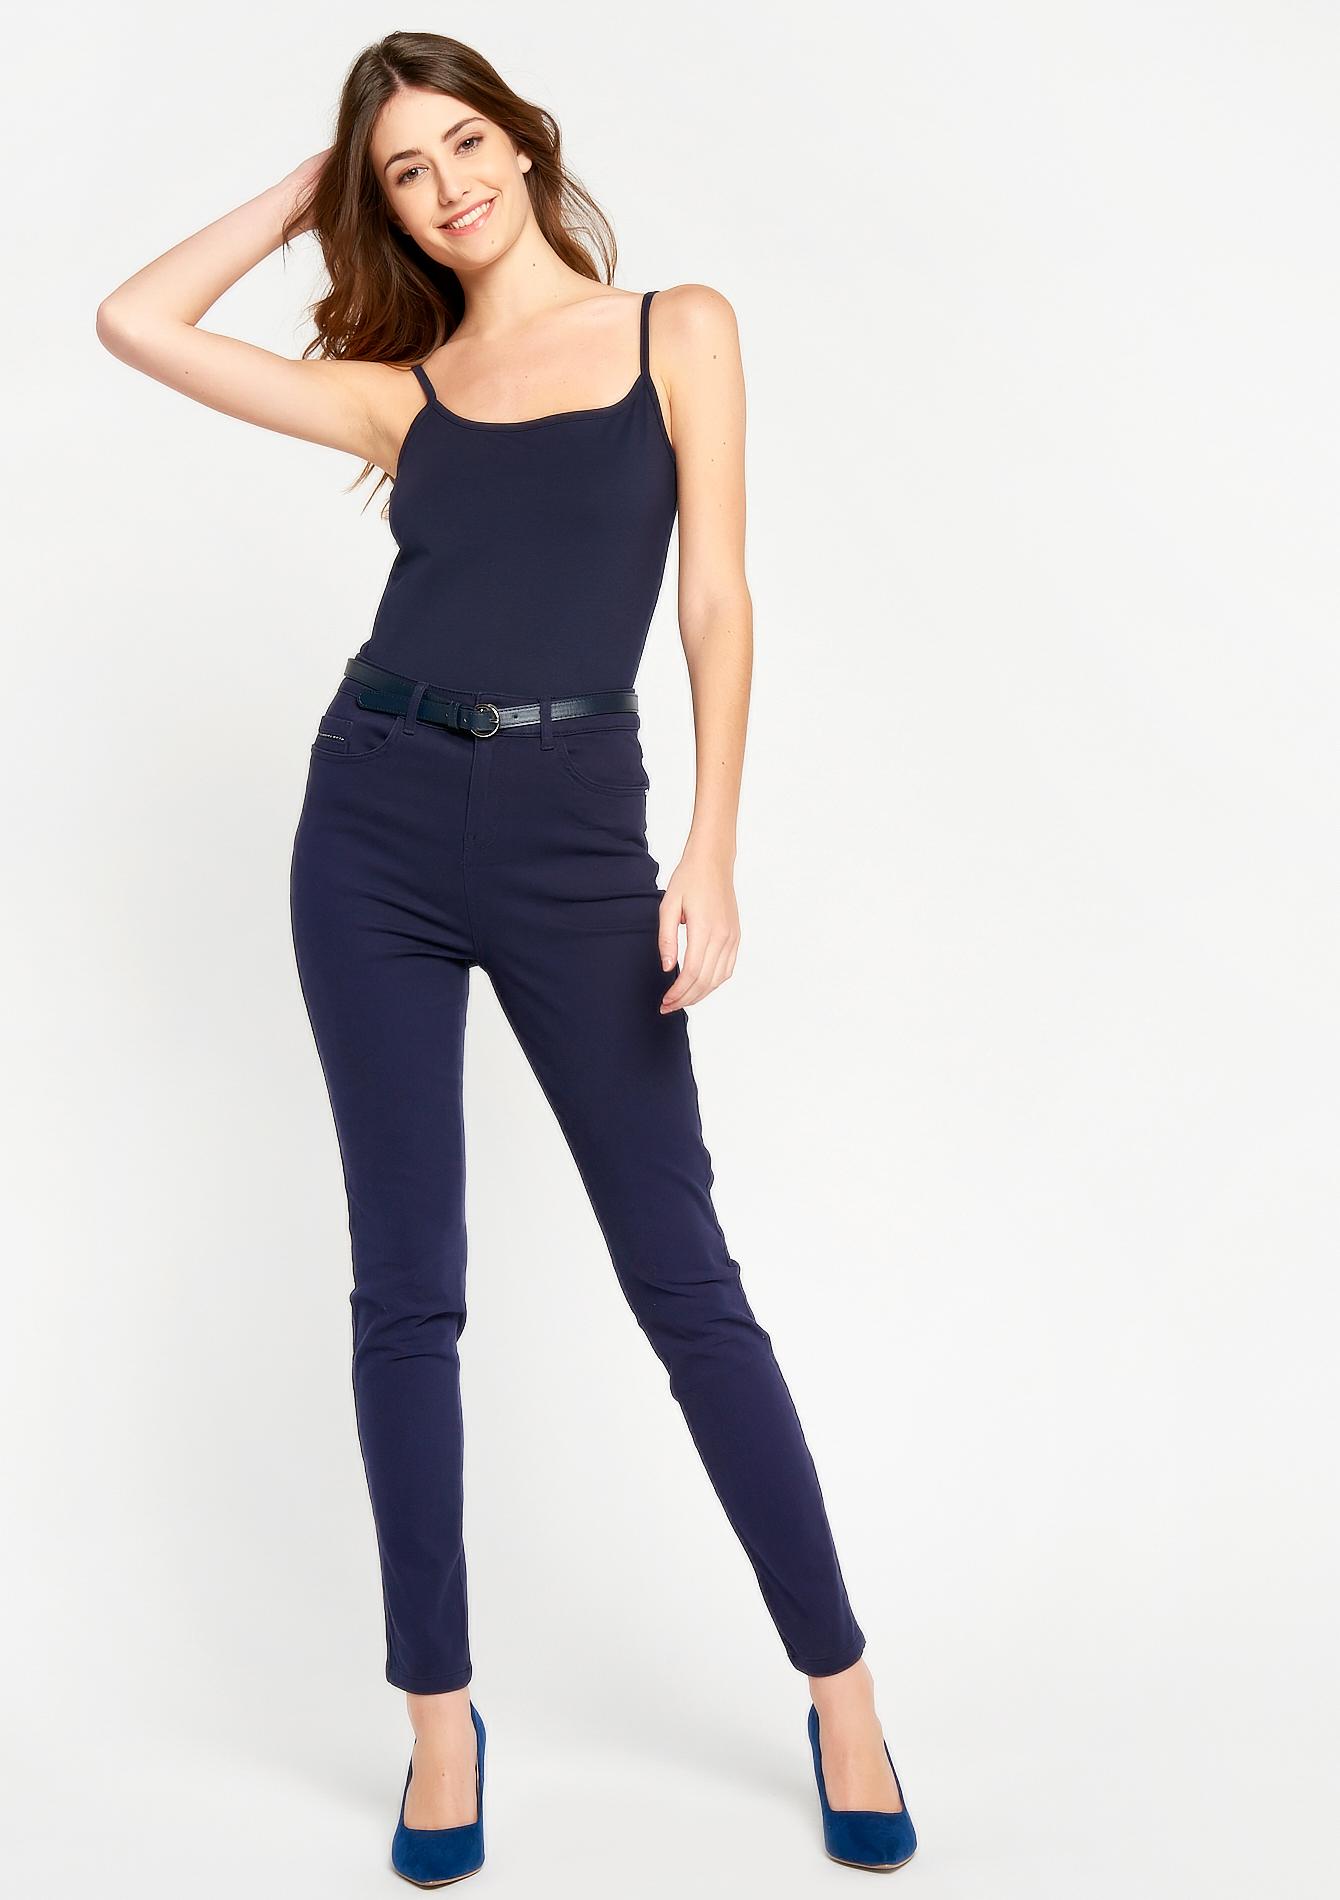 pantalon slim taille haute lolaliza. Black Bedroom Furniture Sets. Home Design Ideas